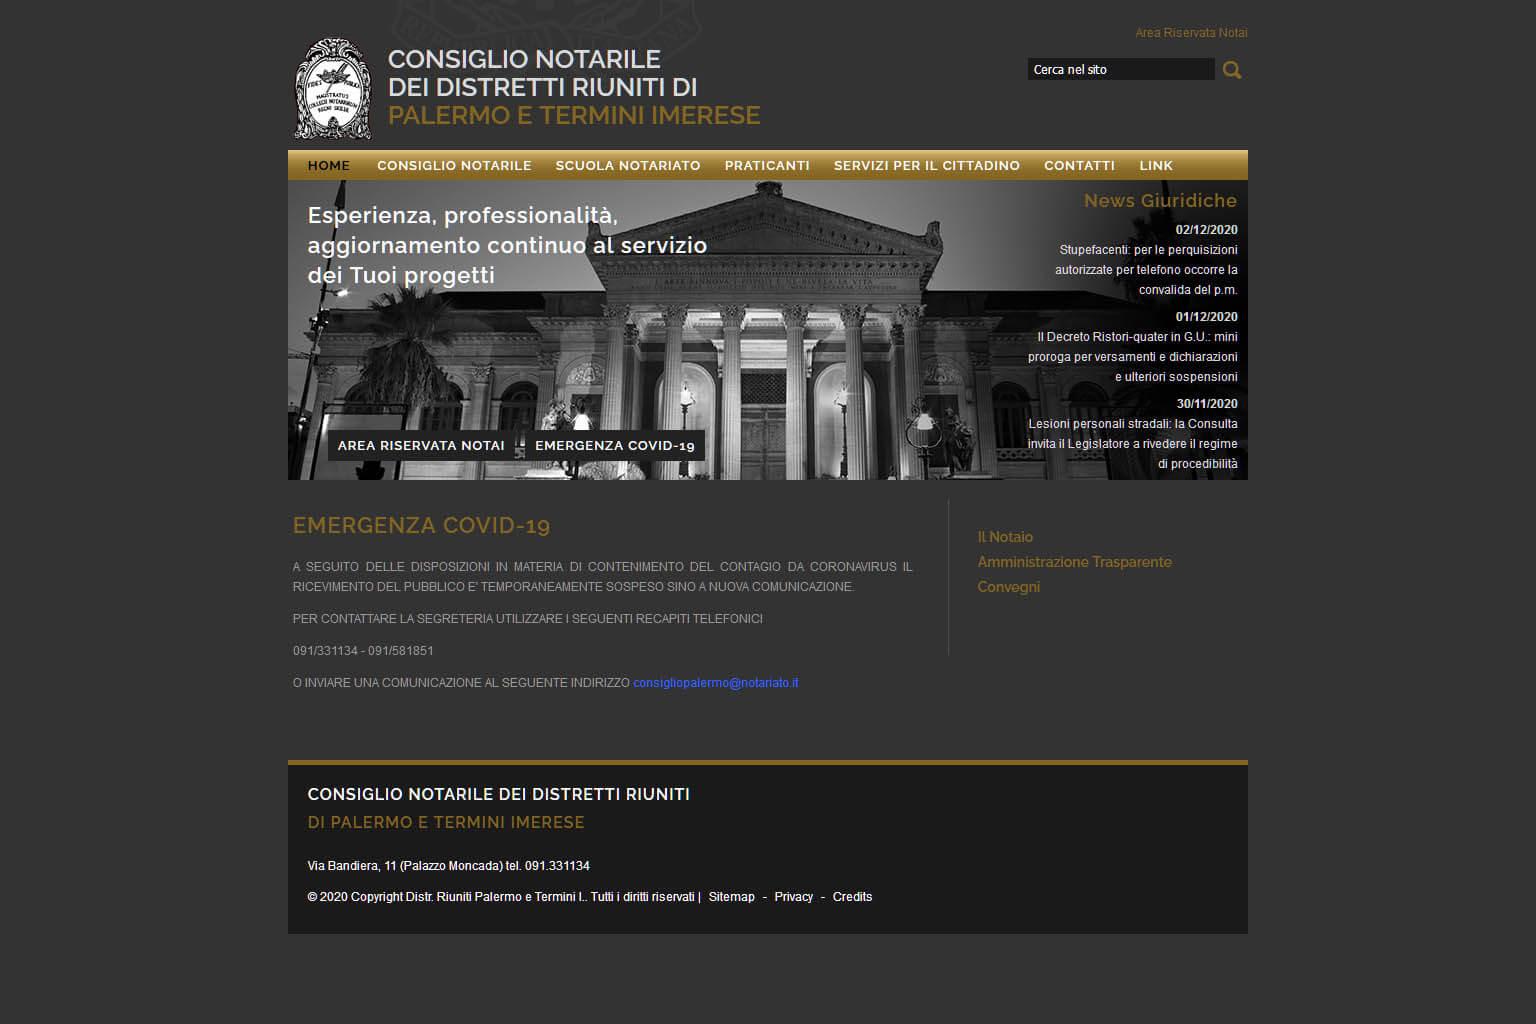 NotaioMyWeb | Consiglio Notarile Palermo